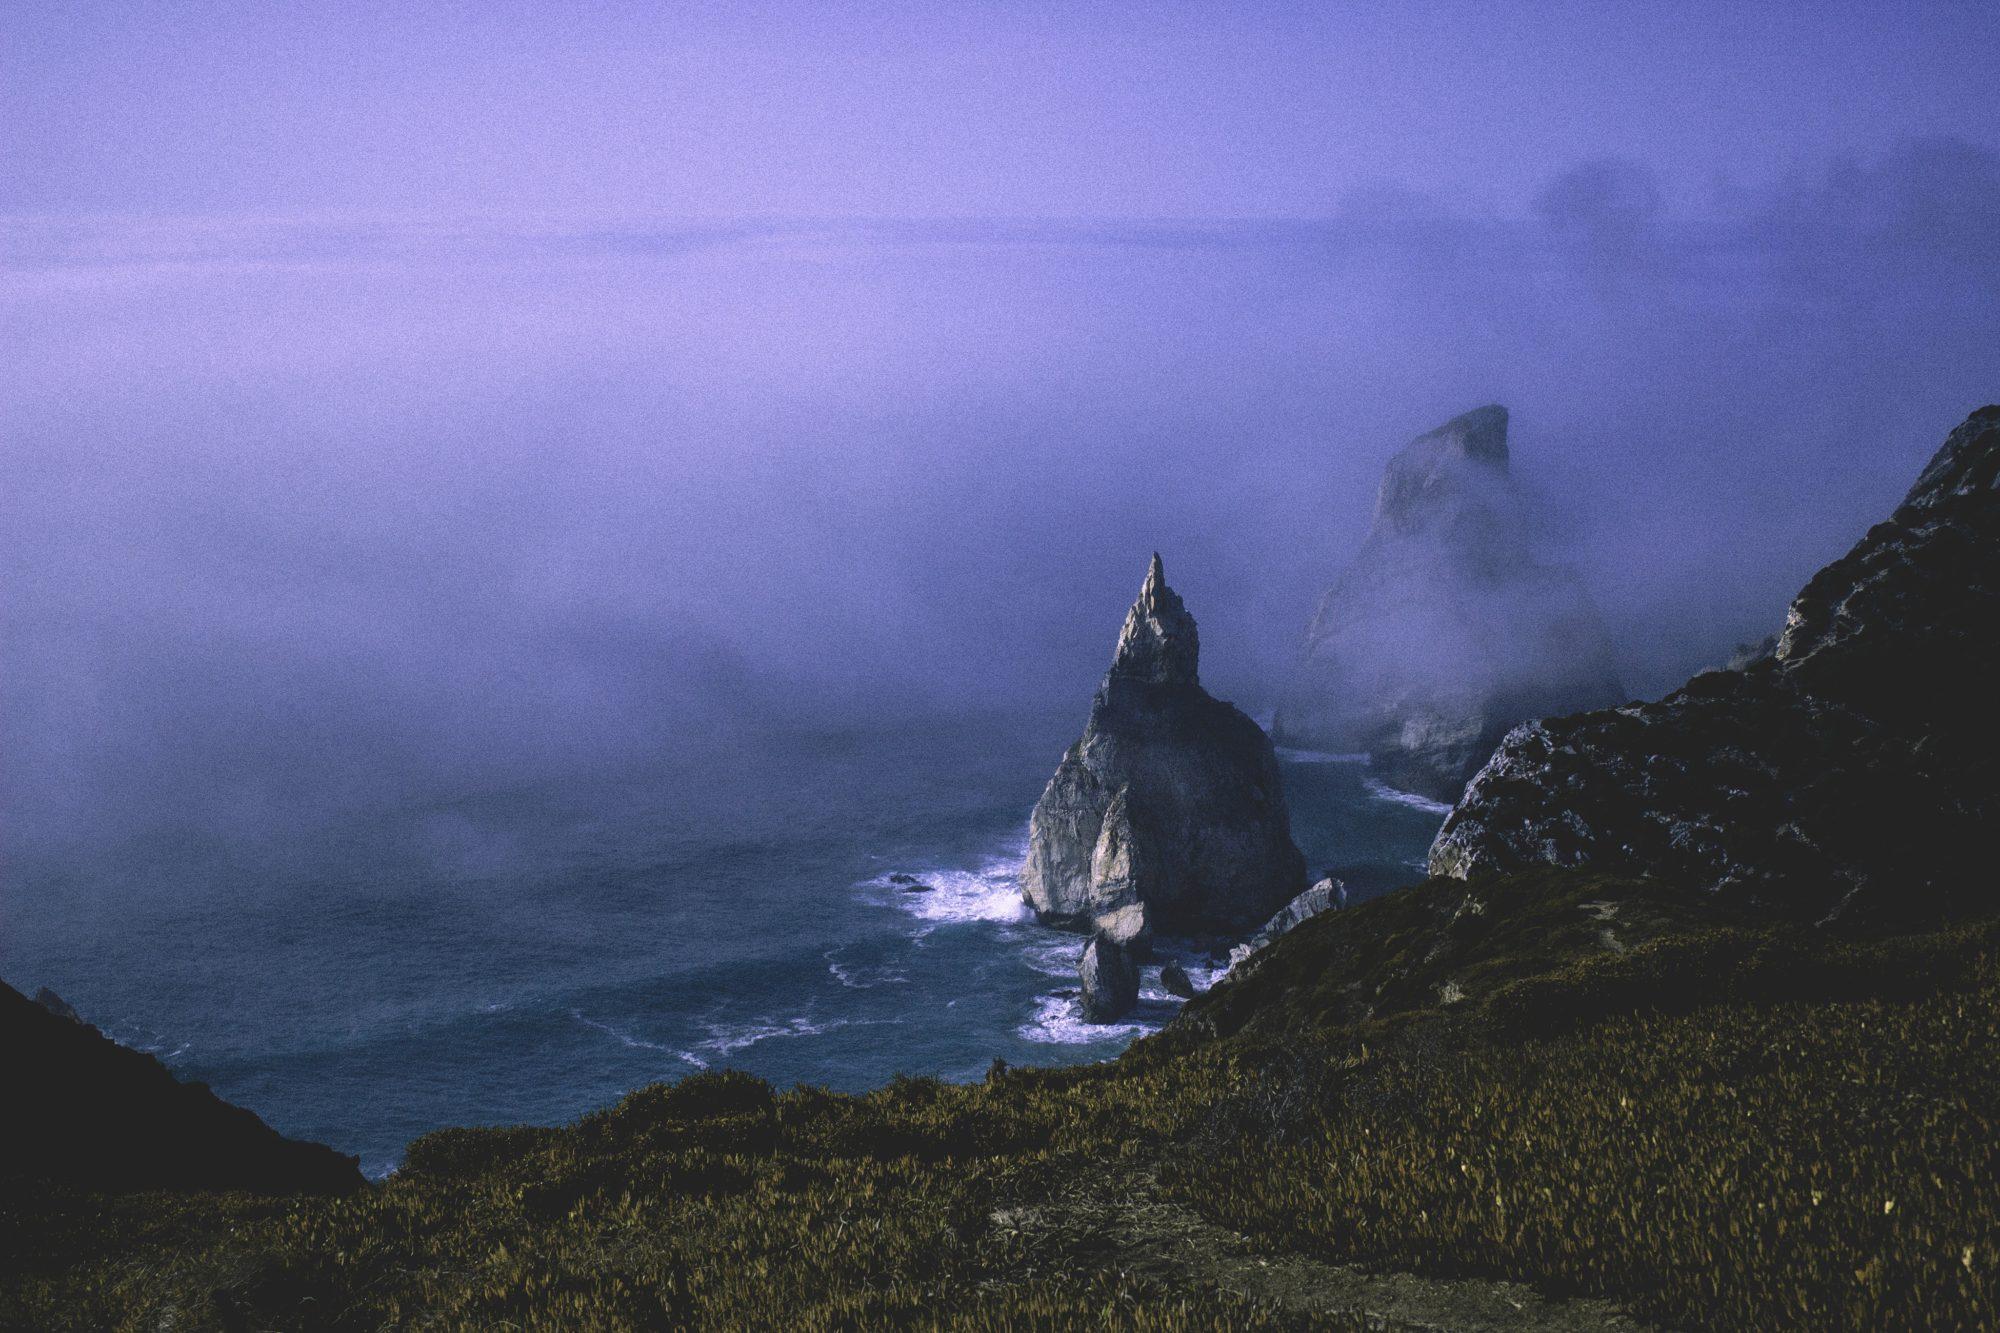 Sintra, Best Mountain Towns In Europe